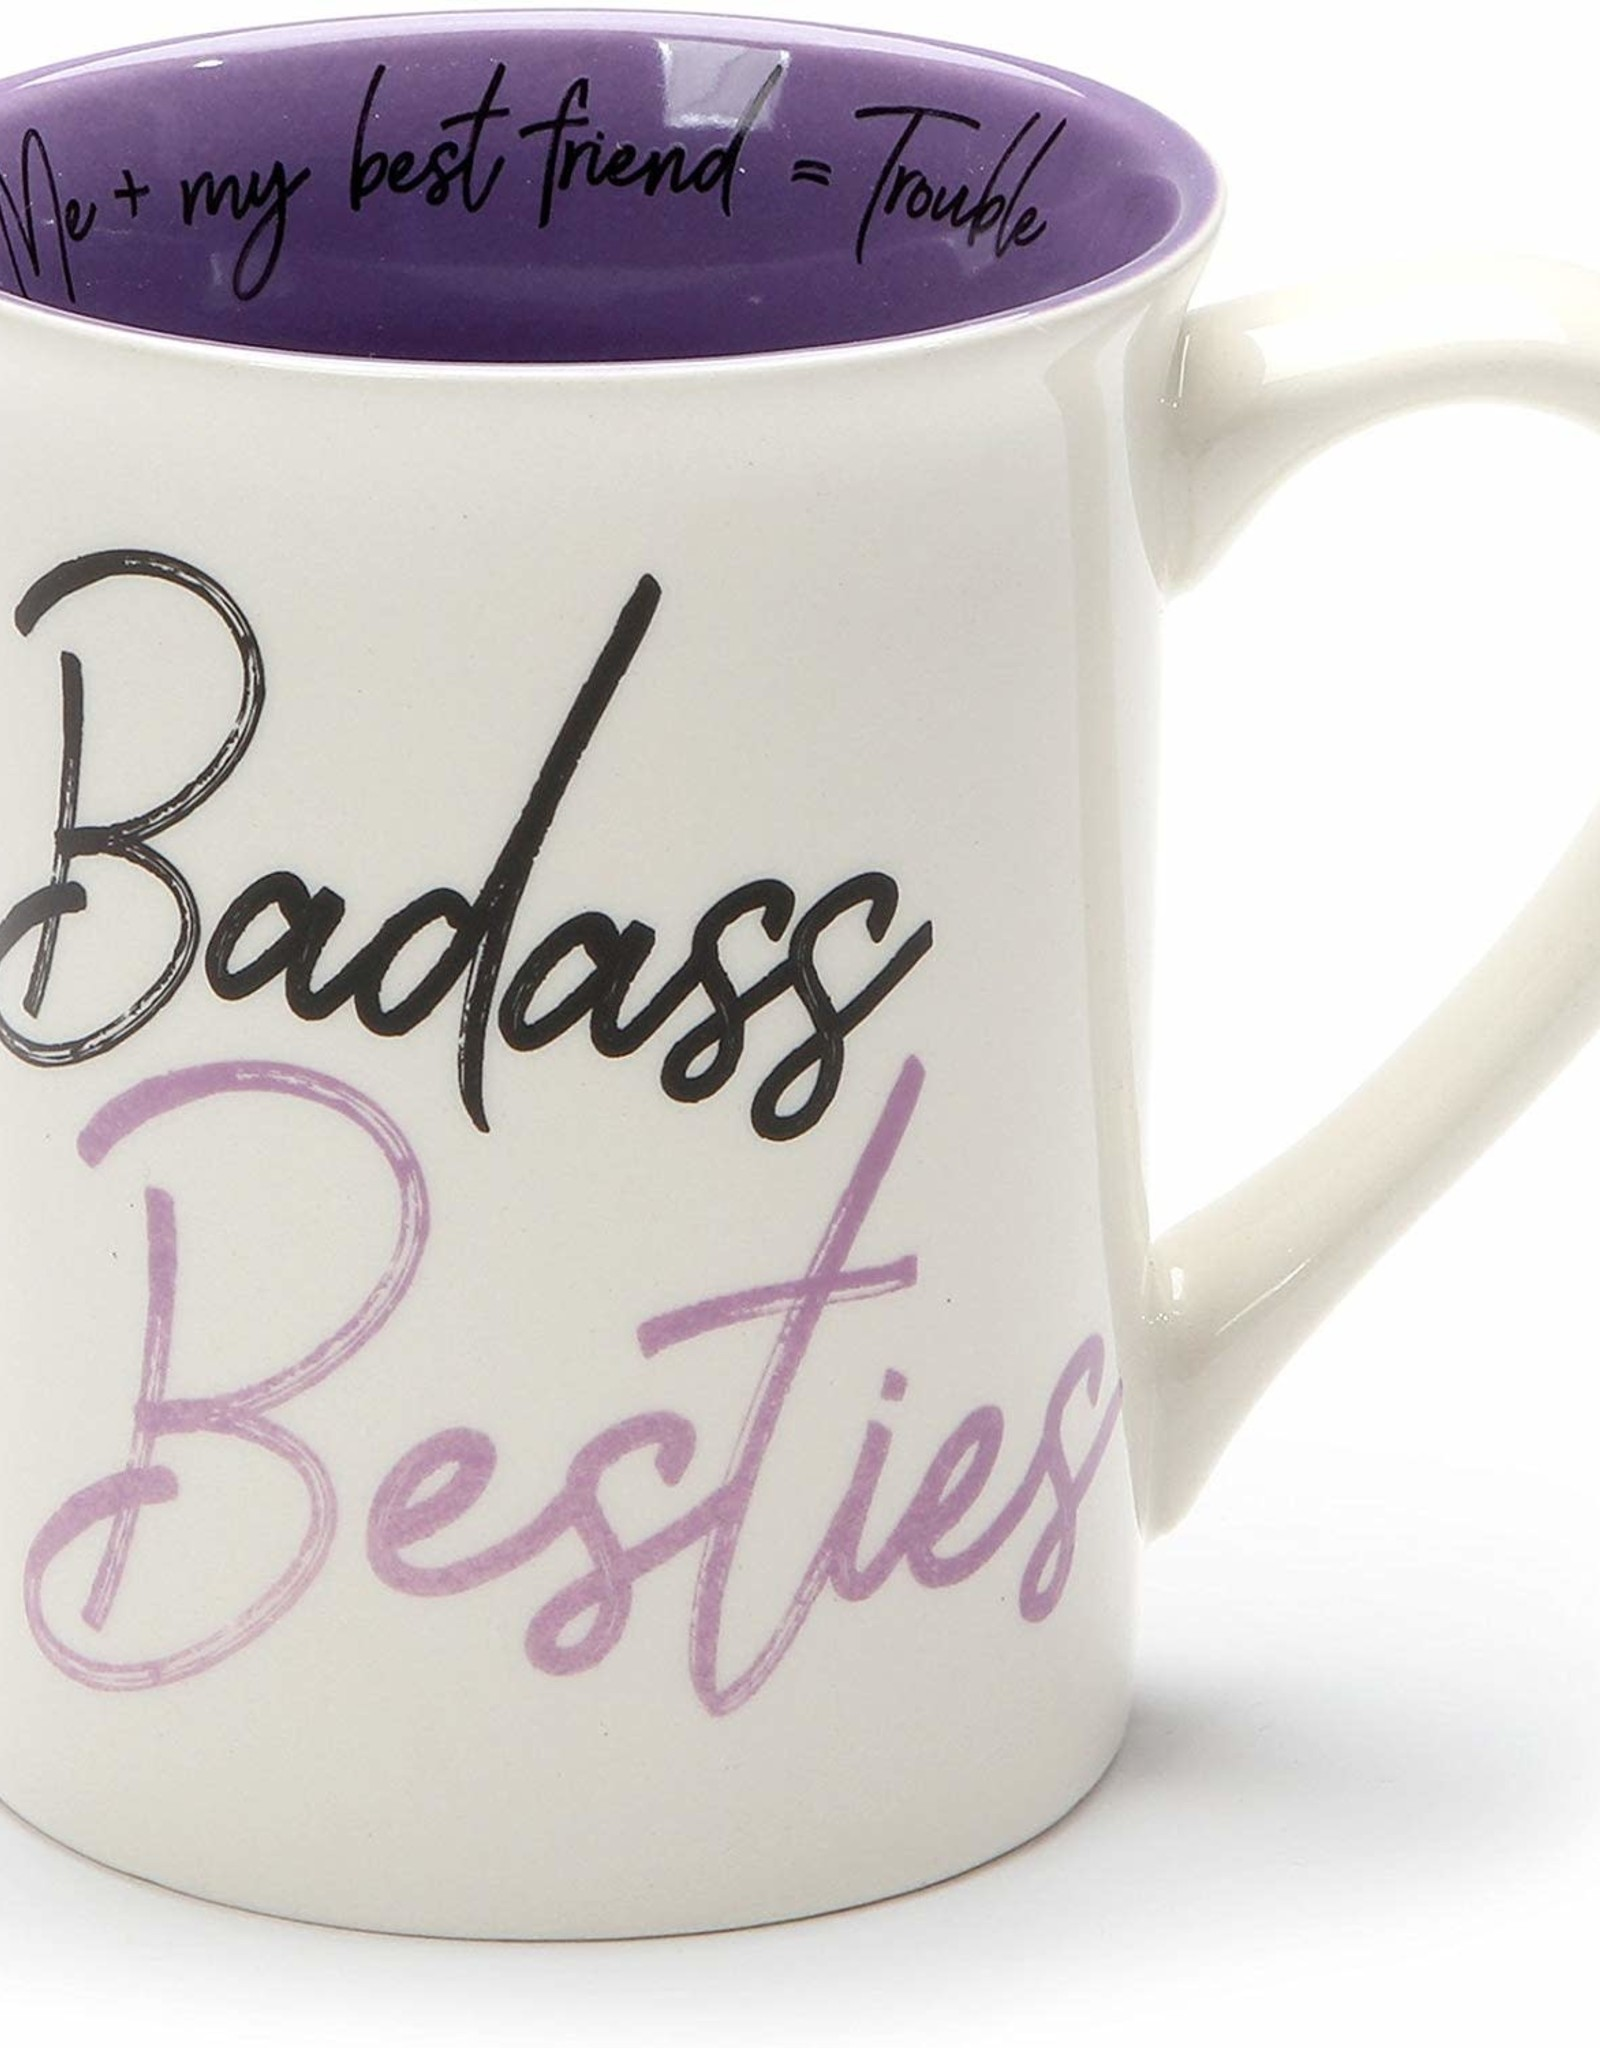 Badass Besties Mug